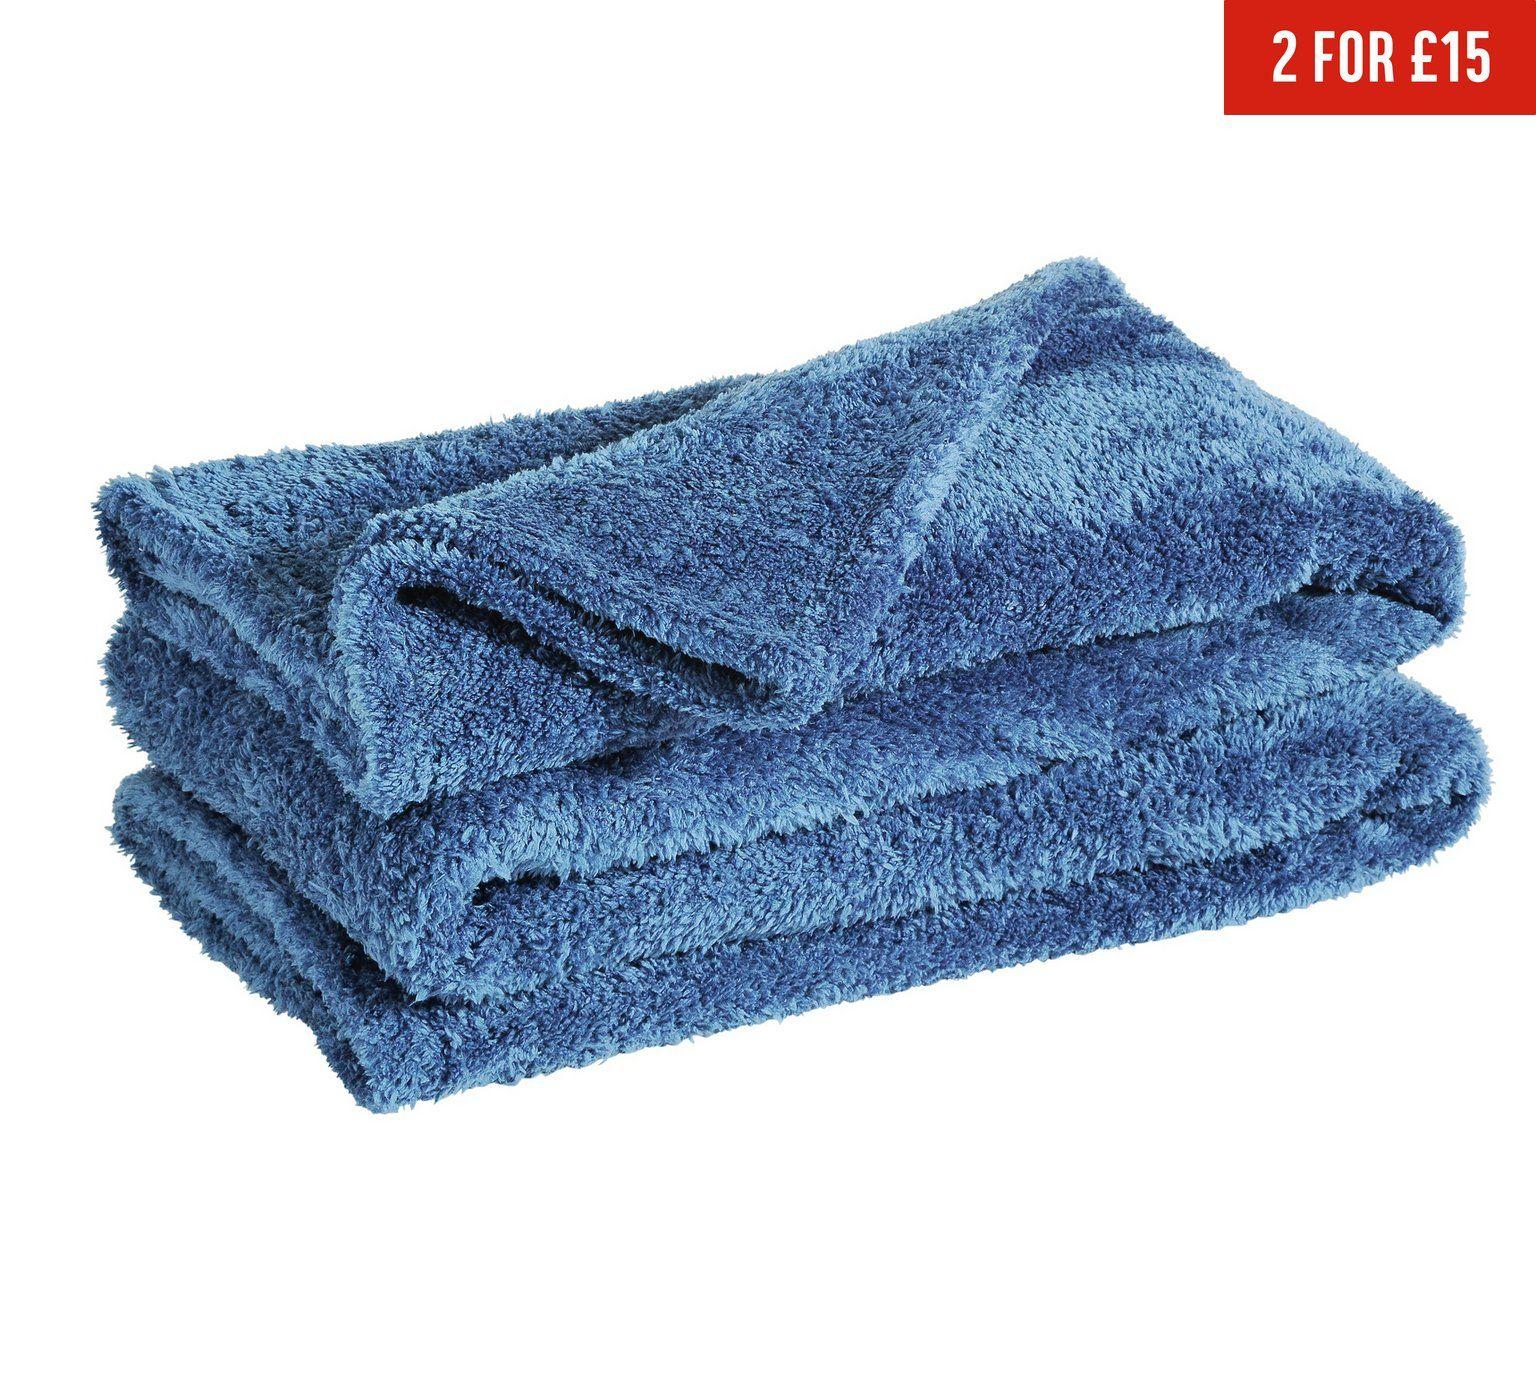 Super soft colour match throw -  Ink Blue. 1/2 price 5.99 @ Argos (black & grey oos)